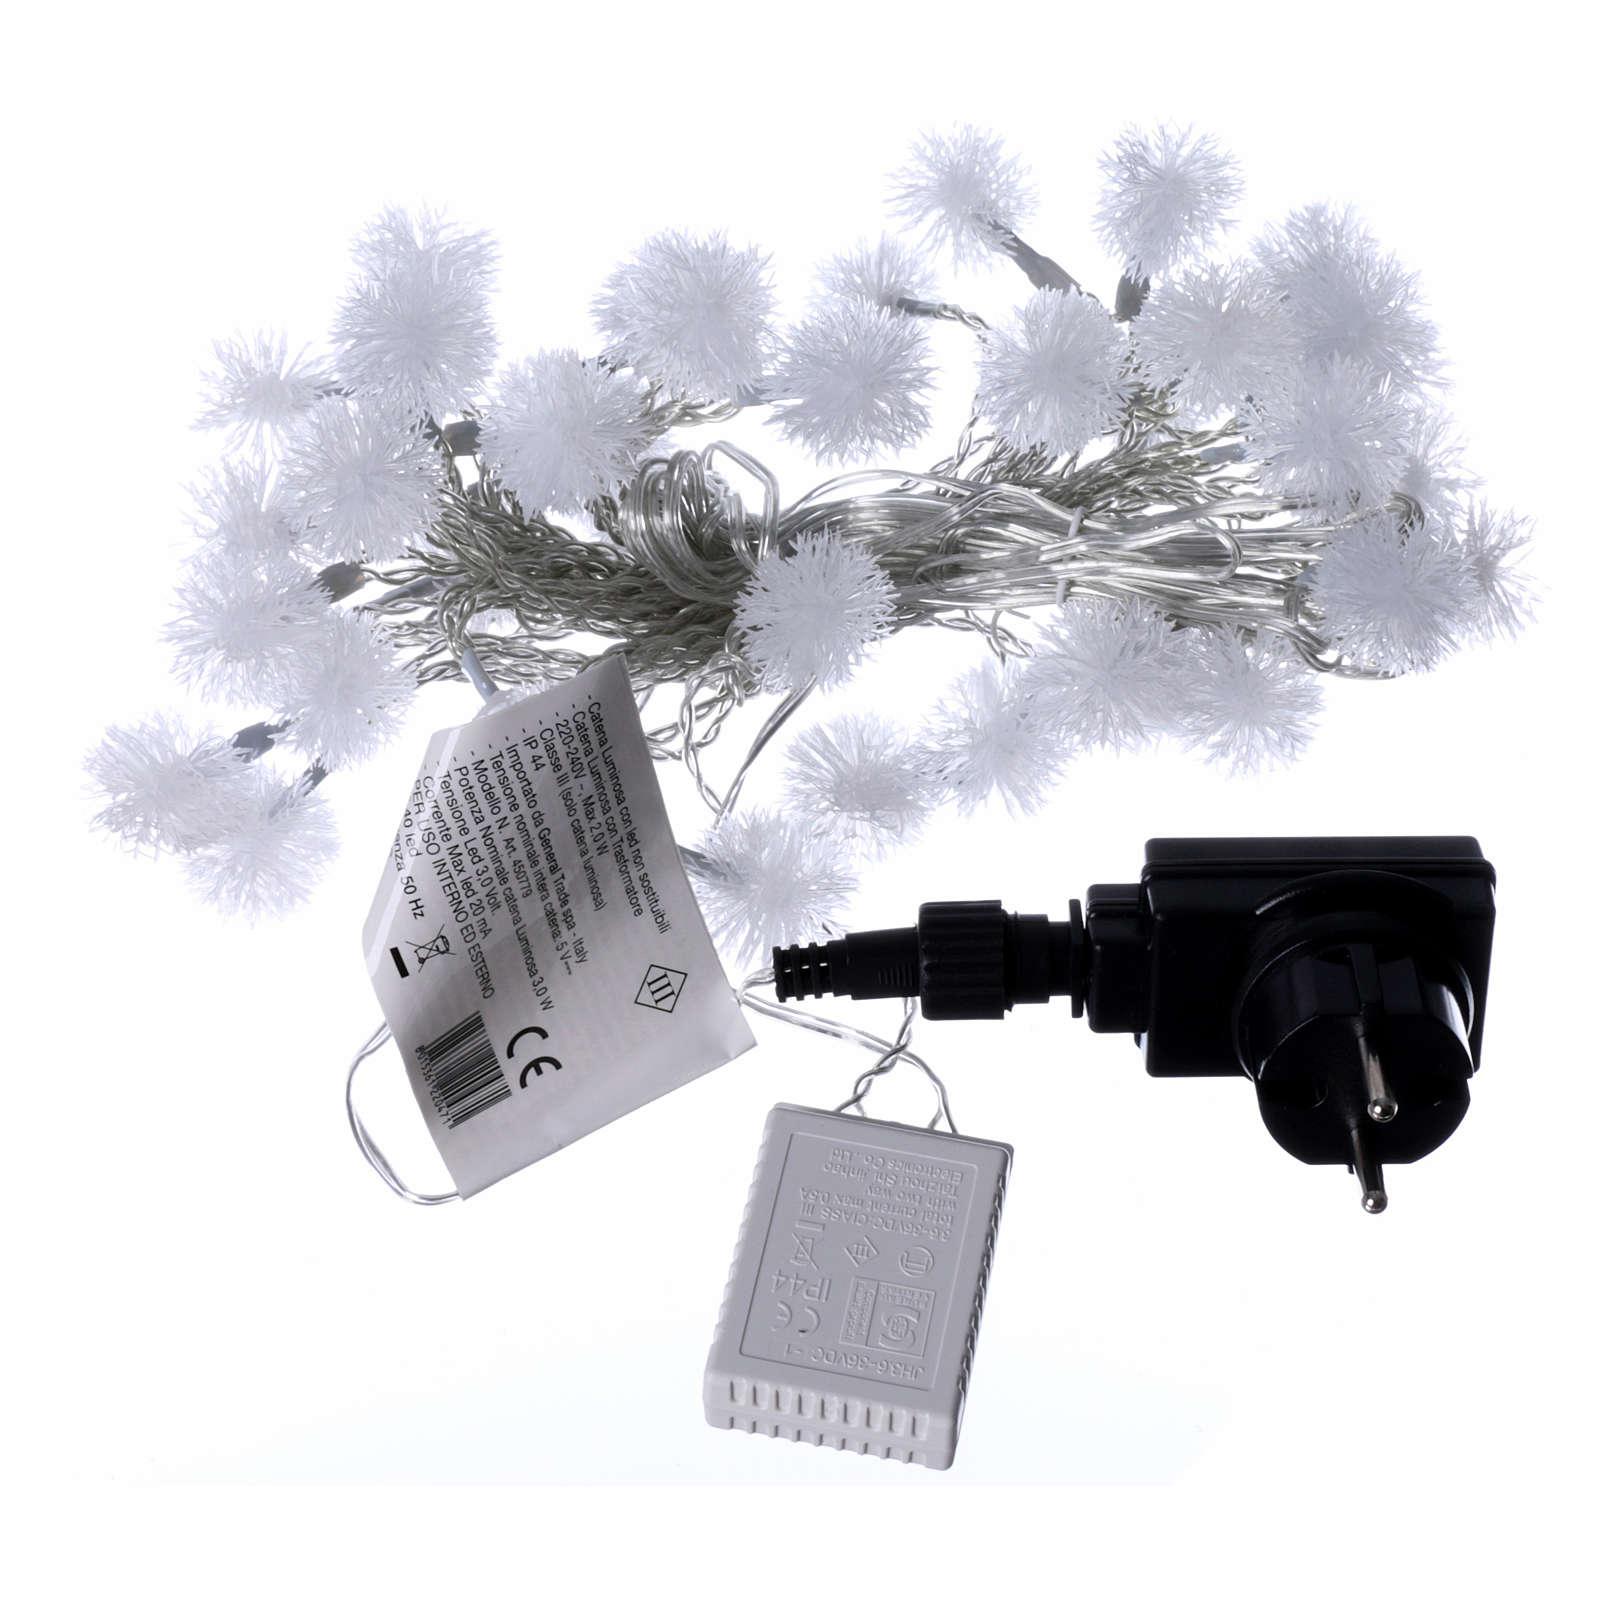 Luci fiocco di neve 40 LED  bianco caldo programmabili corrente 3